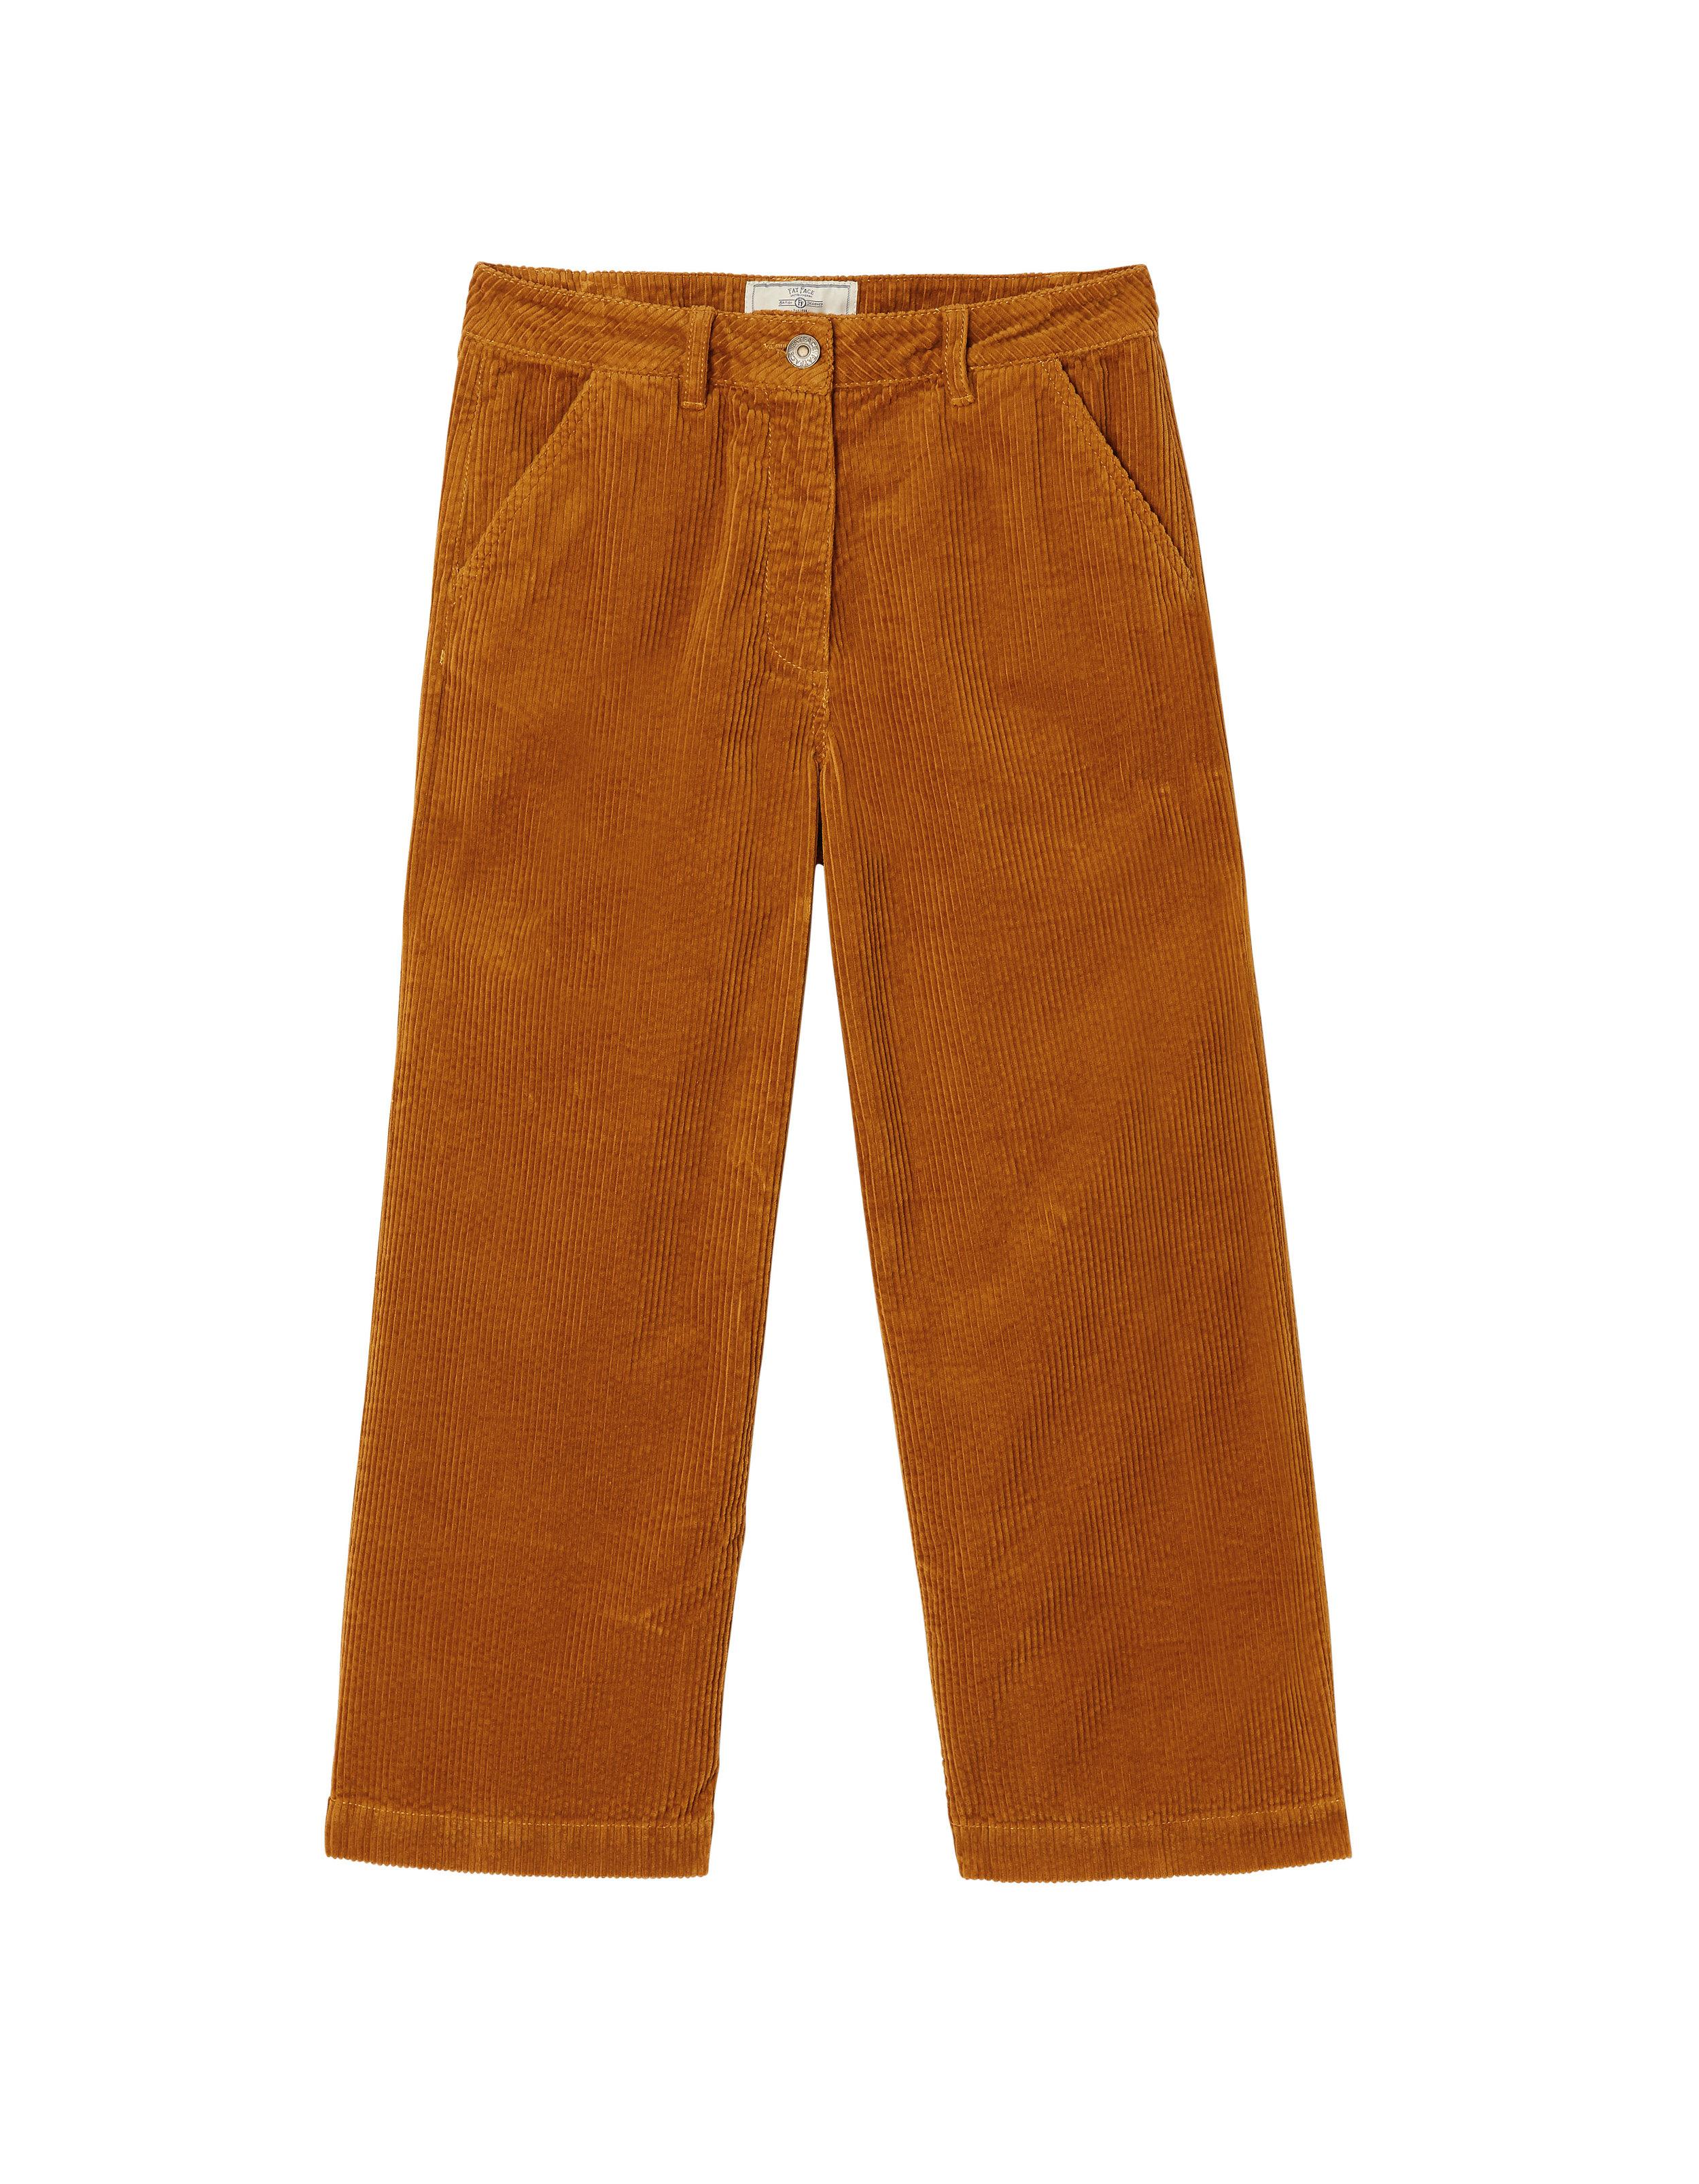 FatFace Cord Trousers in Mustard 946674 £49.50 www.fatface.com.jpg